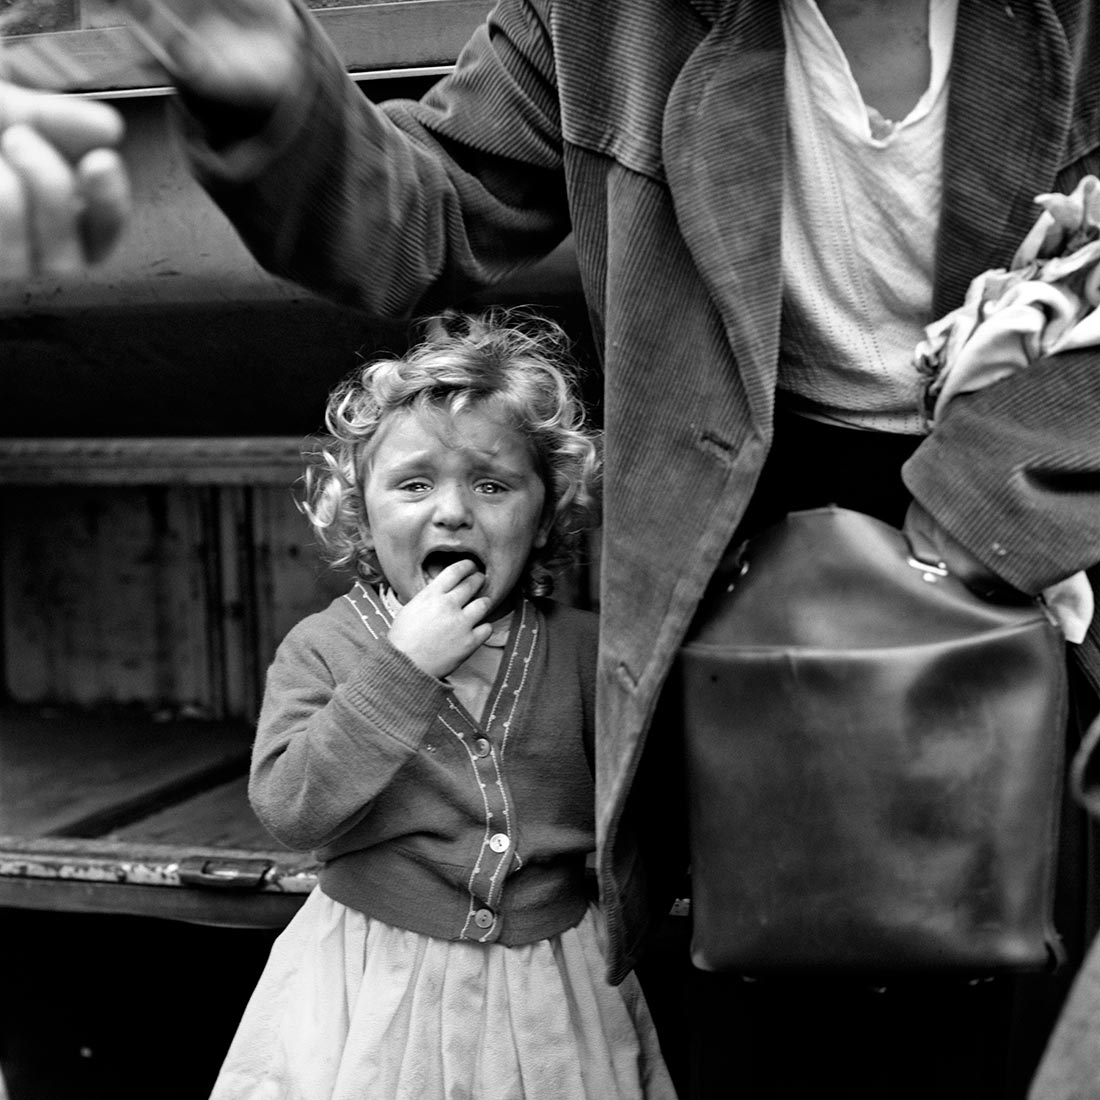 1959, Grenoble, France. Foto: vivianmaier.com